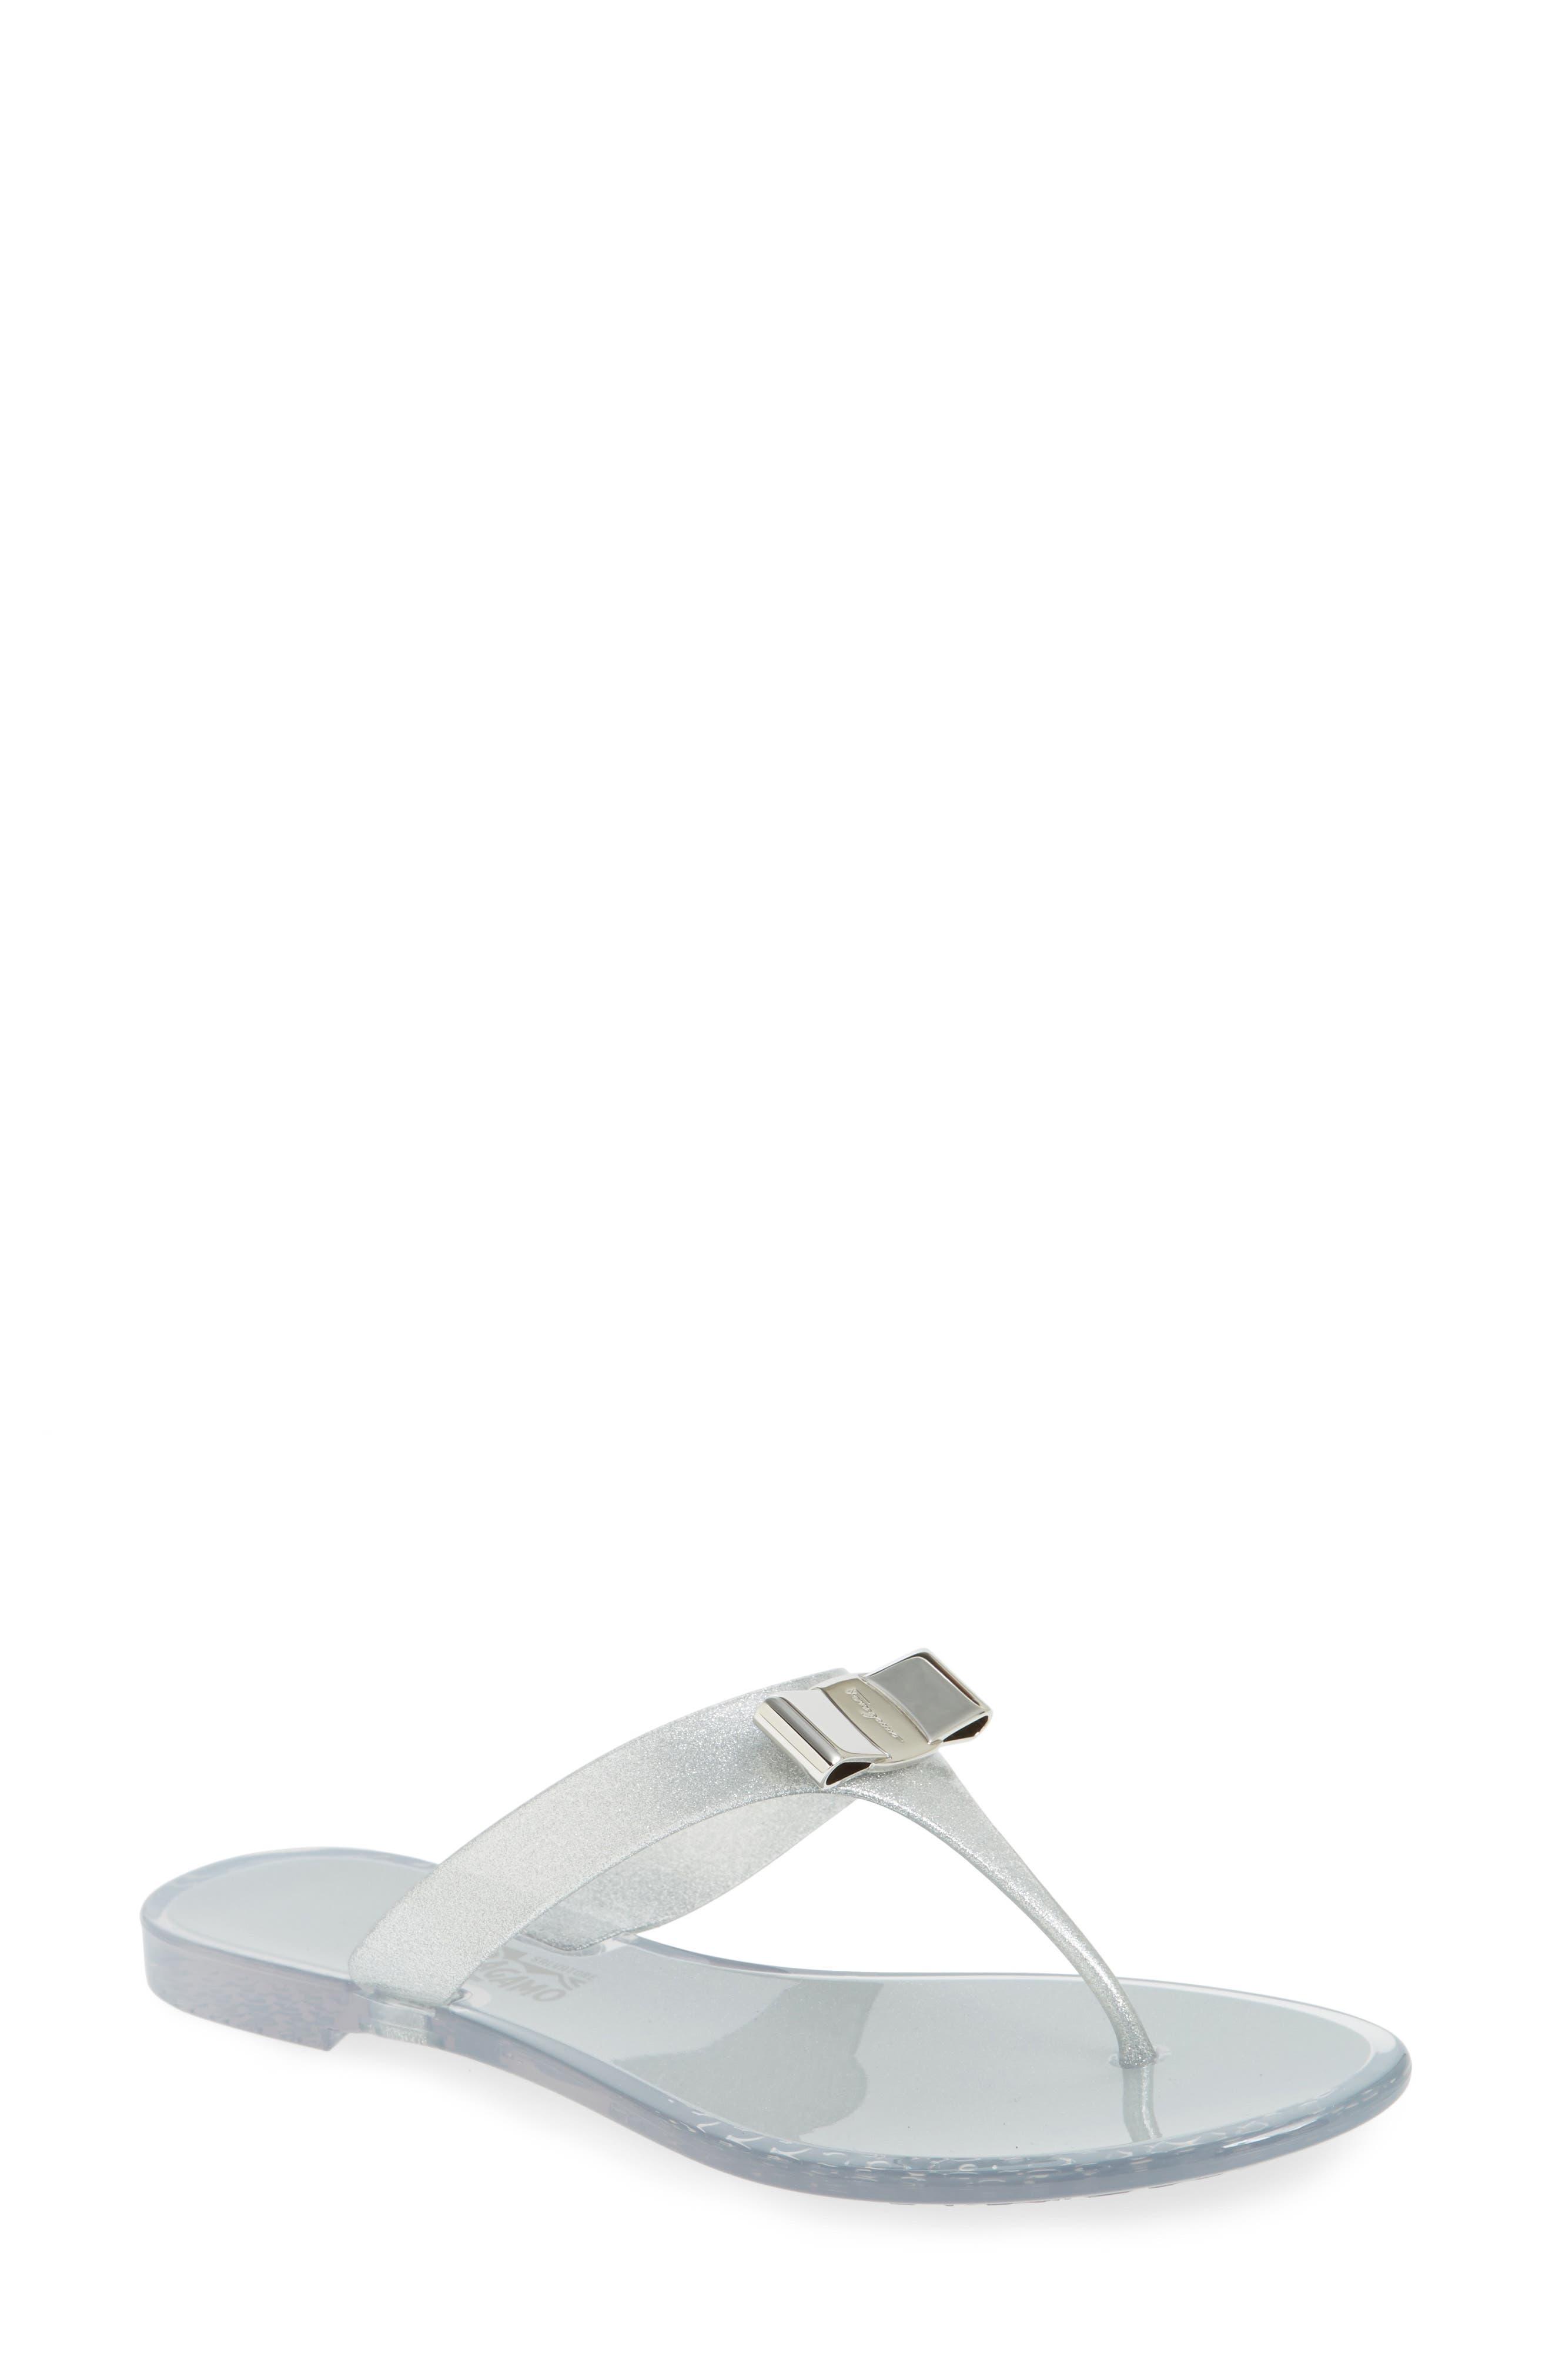 Farelia Jelly Flat Bow Flip Flop,                         Main,                         color, SILVER GLITTER PVC